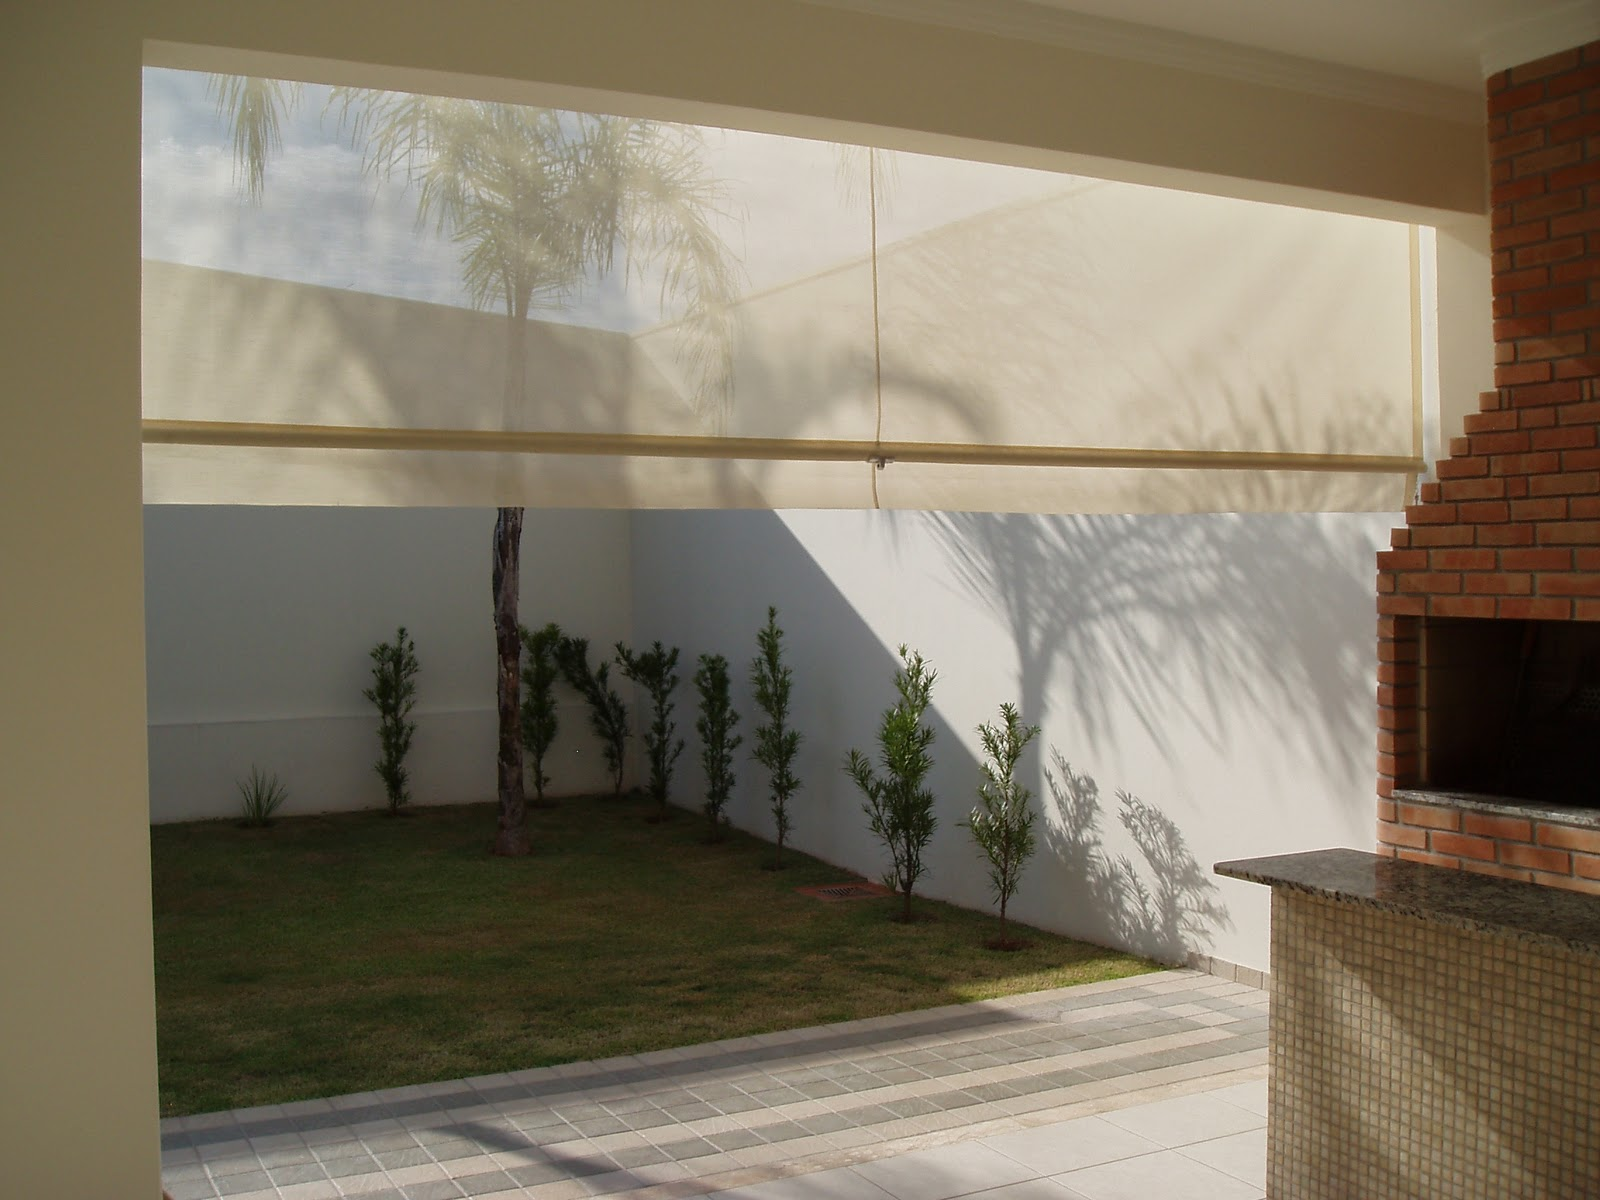 Toldos cortinas em tela solar - Telas para toldos ...